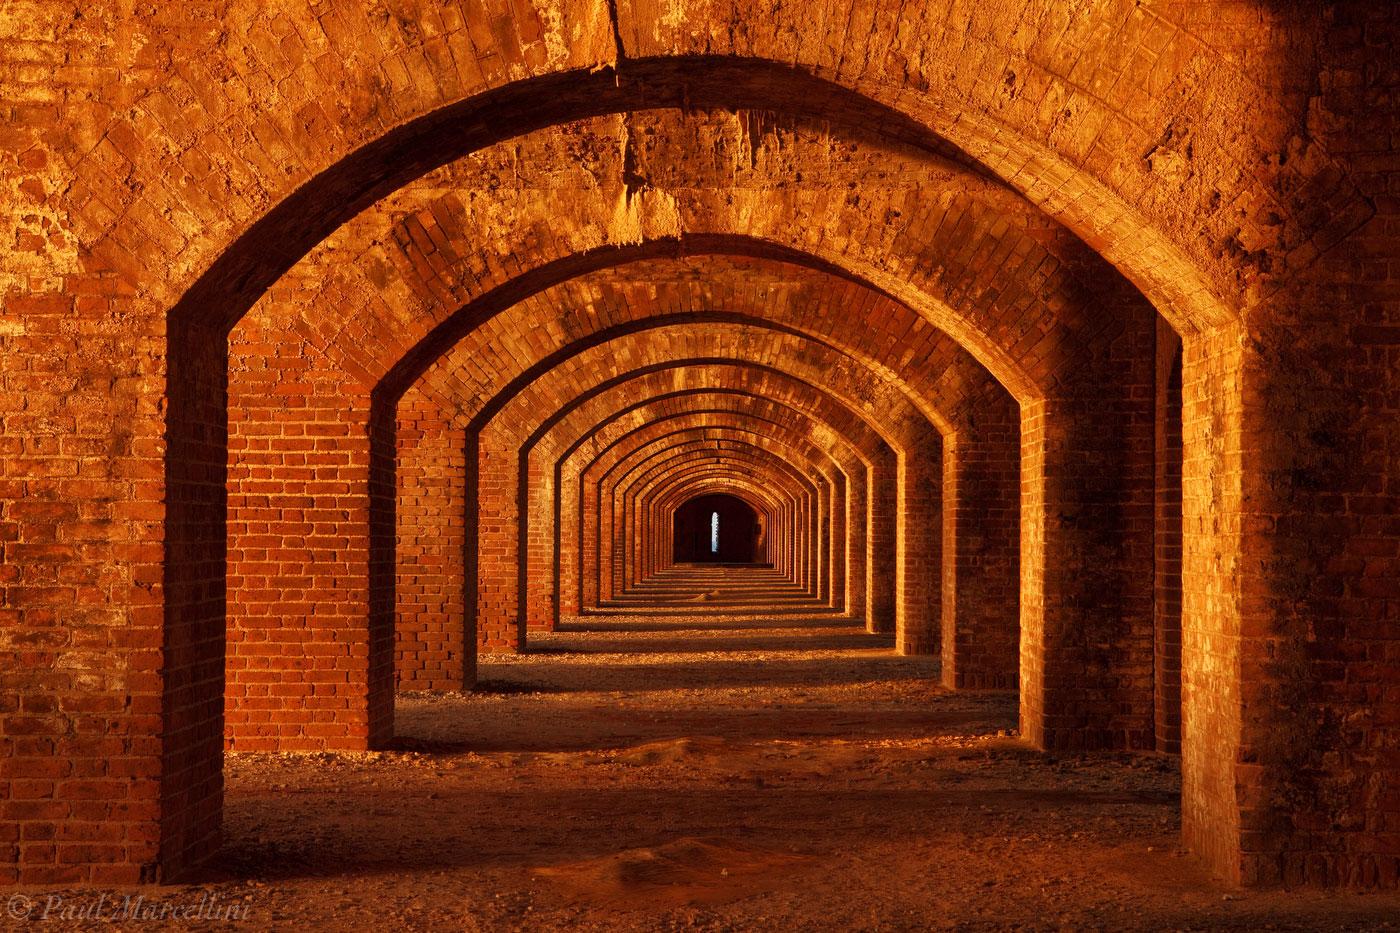 ft. jefferson, dry tortugas, arches, hallway, brick, fort jefferson, arches, florida, south florida, nature, photography, photo